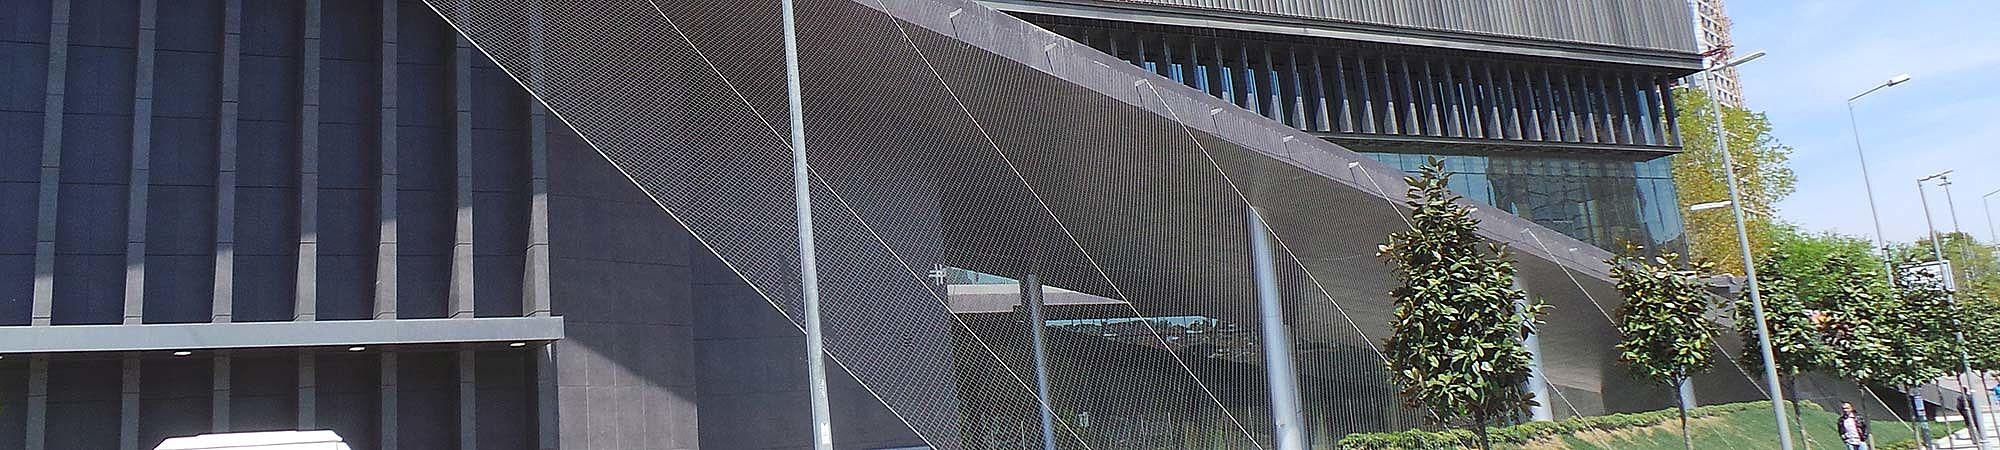 Begrünung Rathaus Istanbul X-TEND Edelstahl-Seilnetz